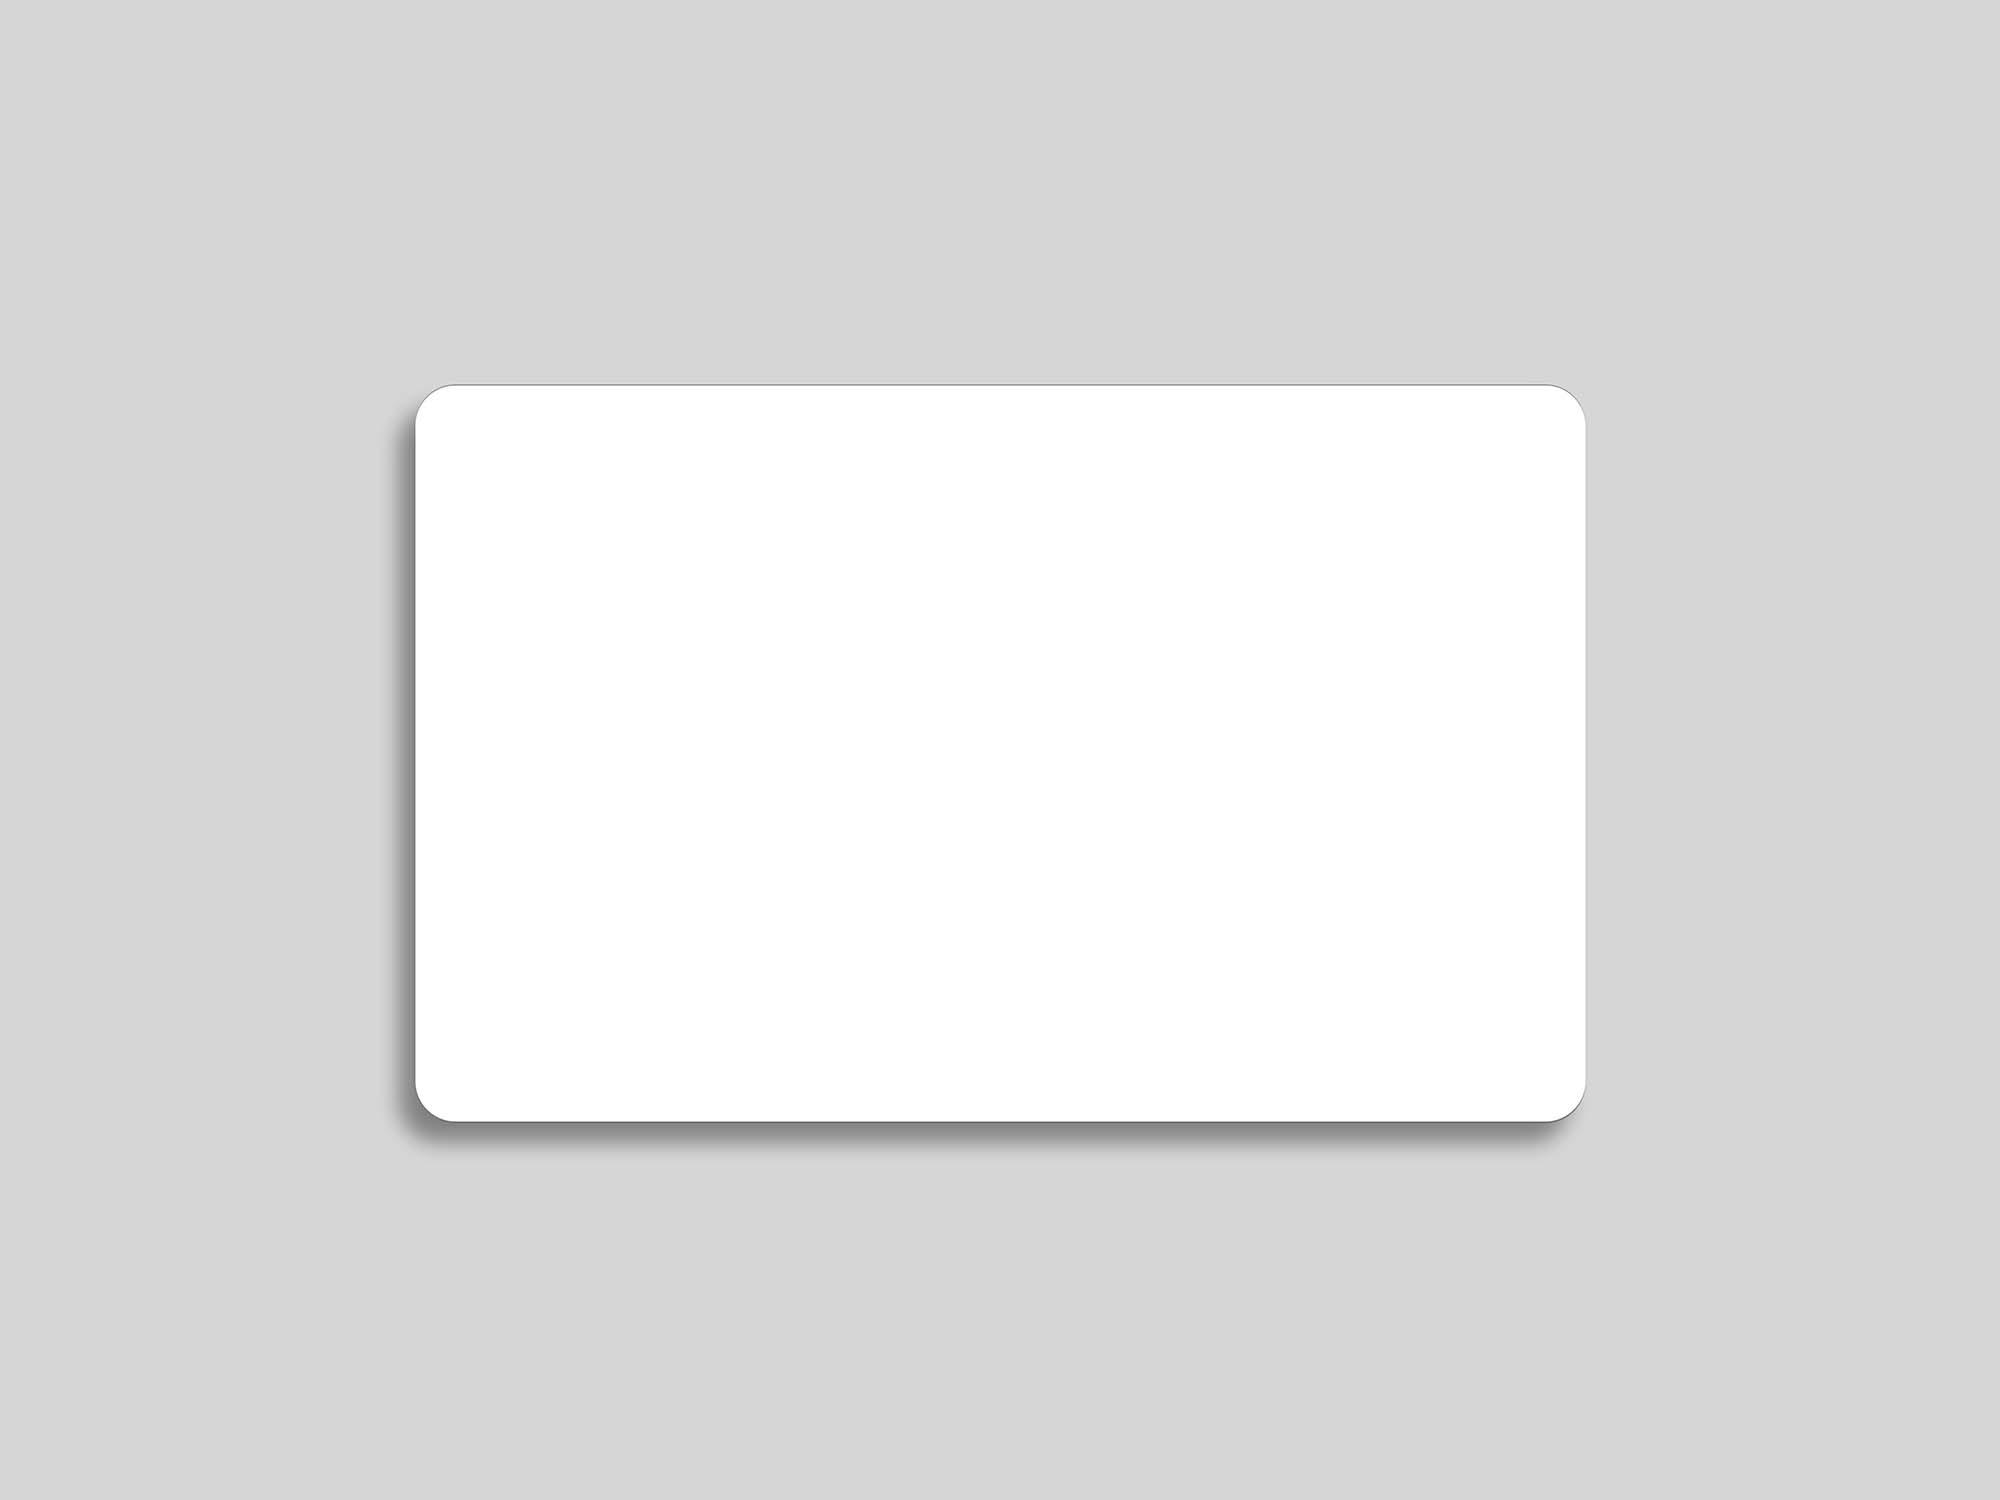 Plastic Debit Card Mockup 2